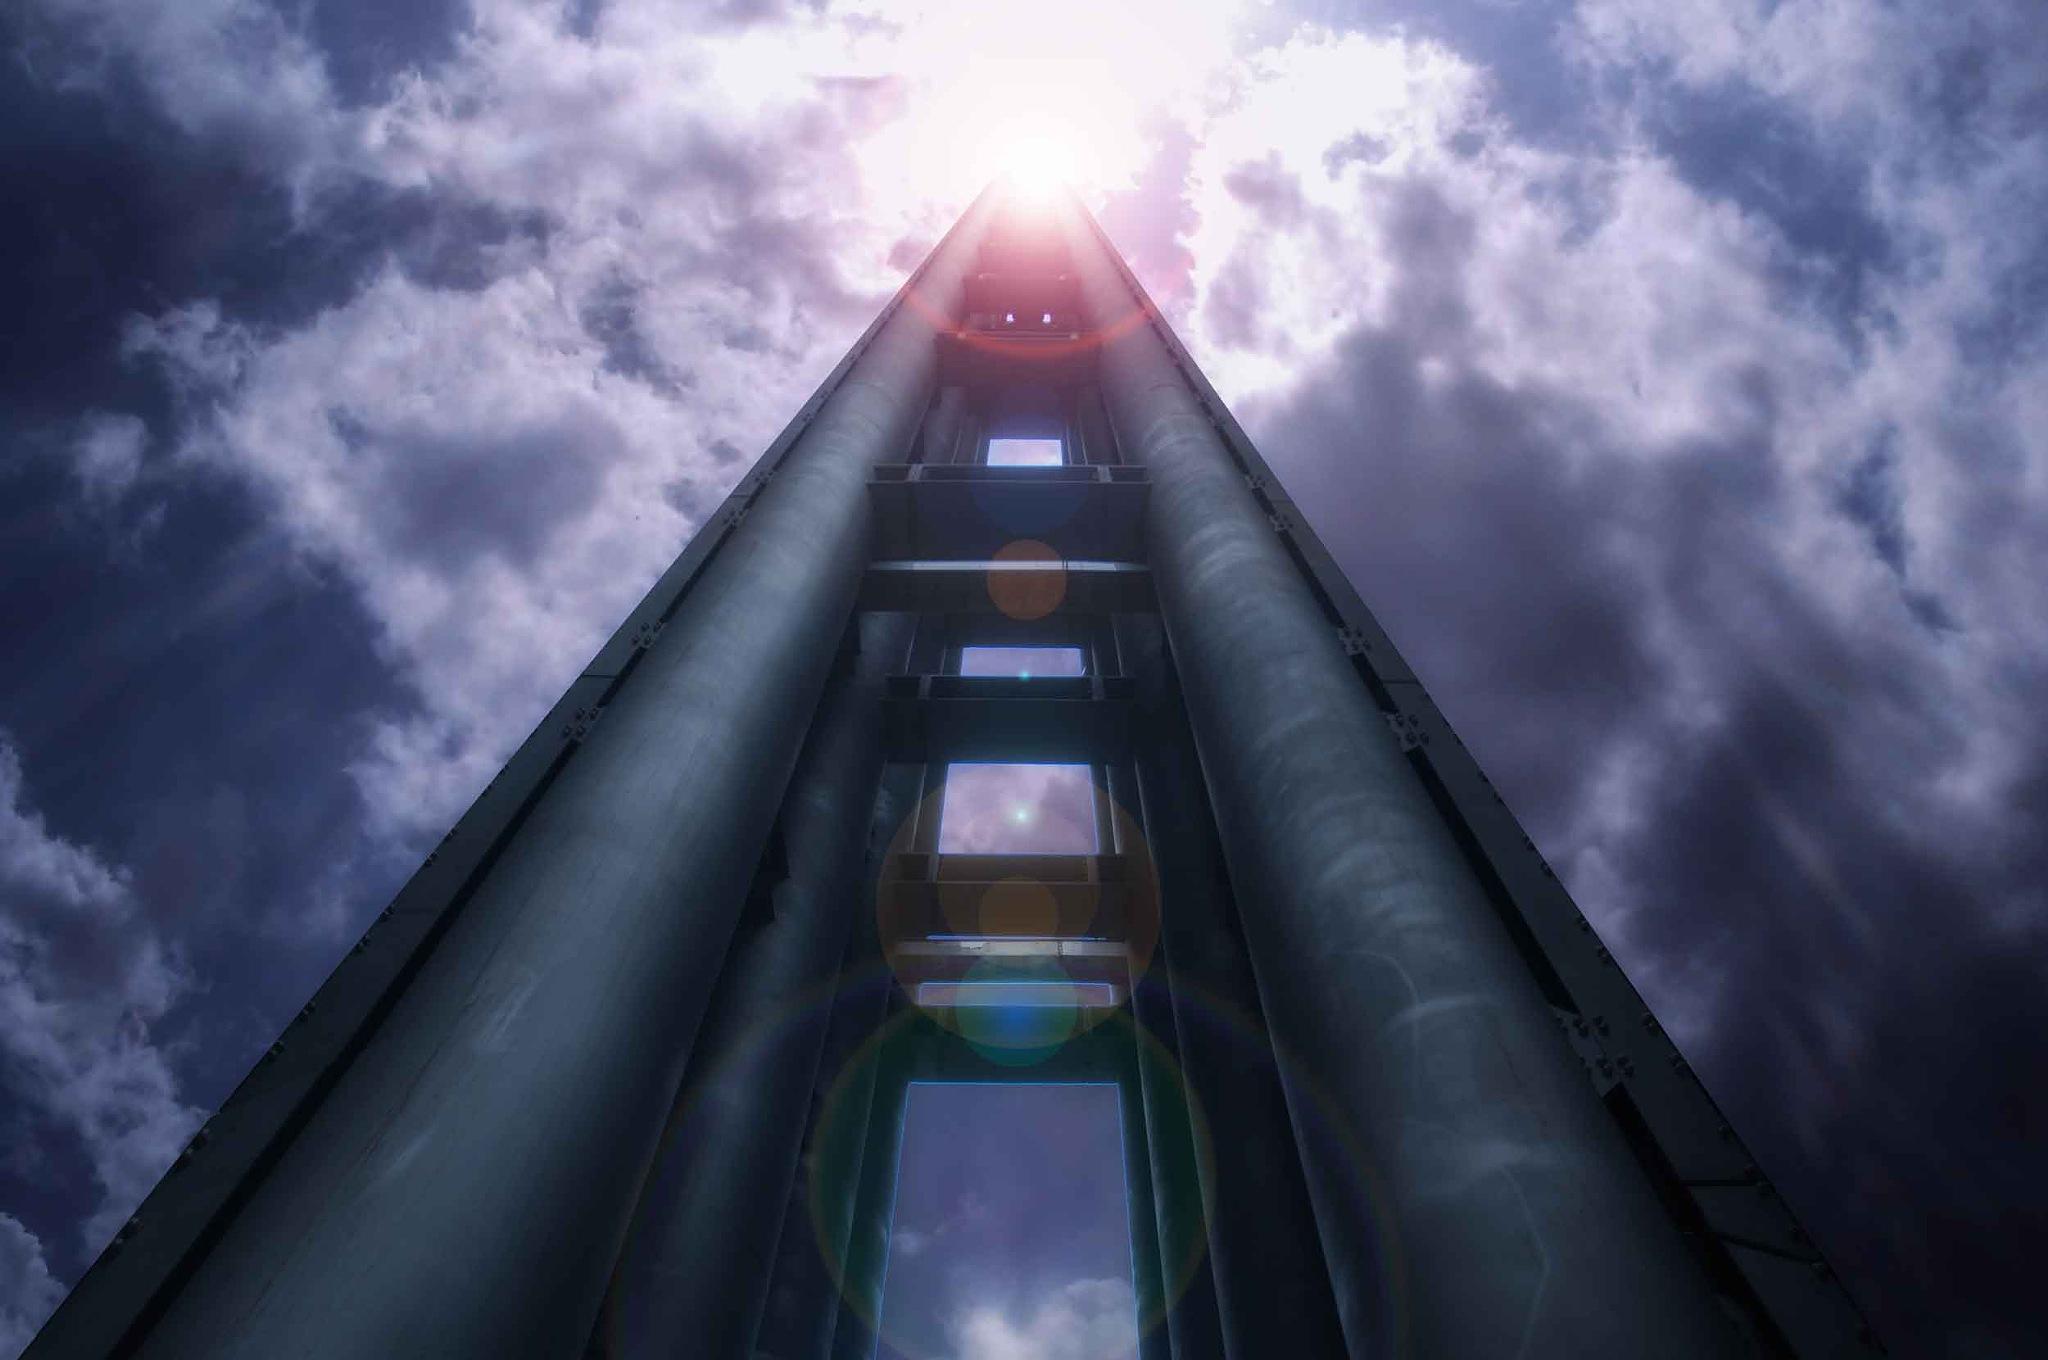 The Stele of Light by Gabo Romero